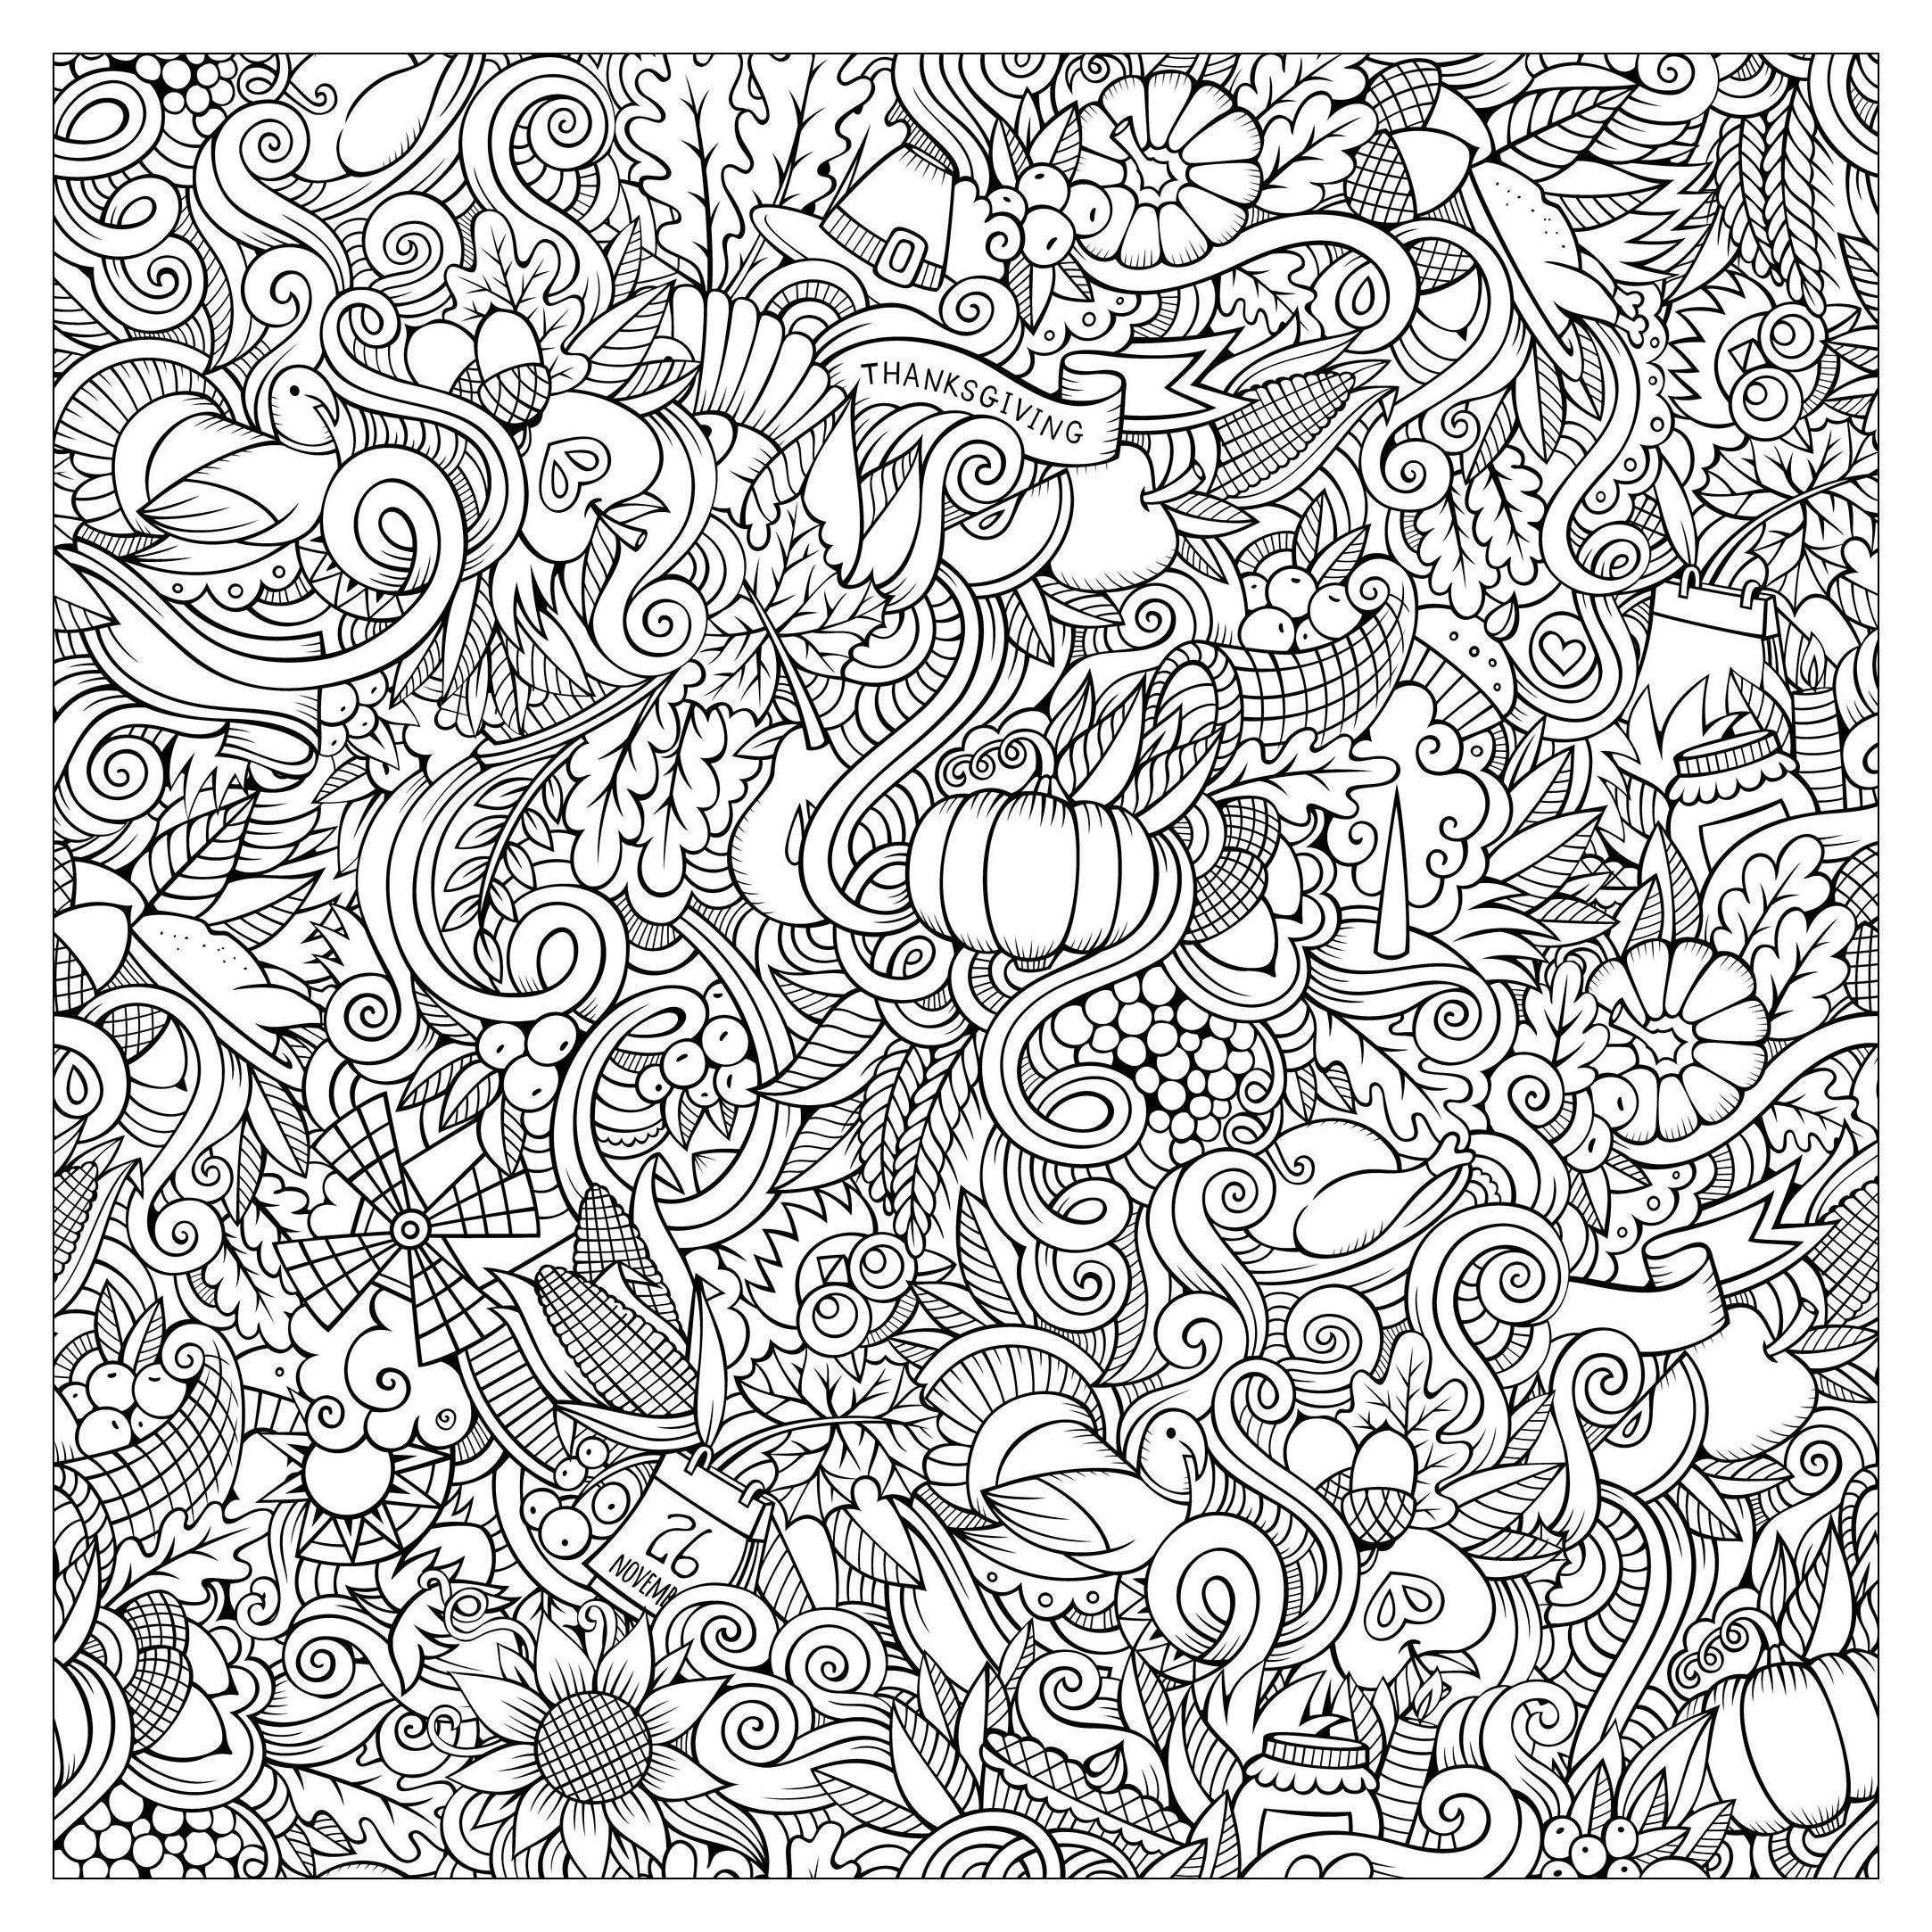 2166x2166 Cartoon Vector Hand Drawn Doodles Thanksgiving Autumn Symbols